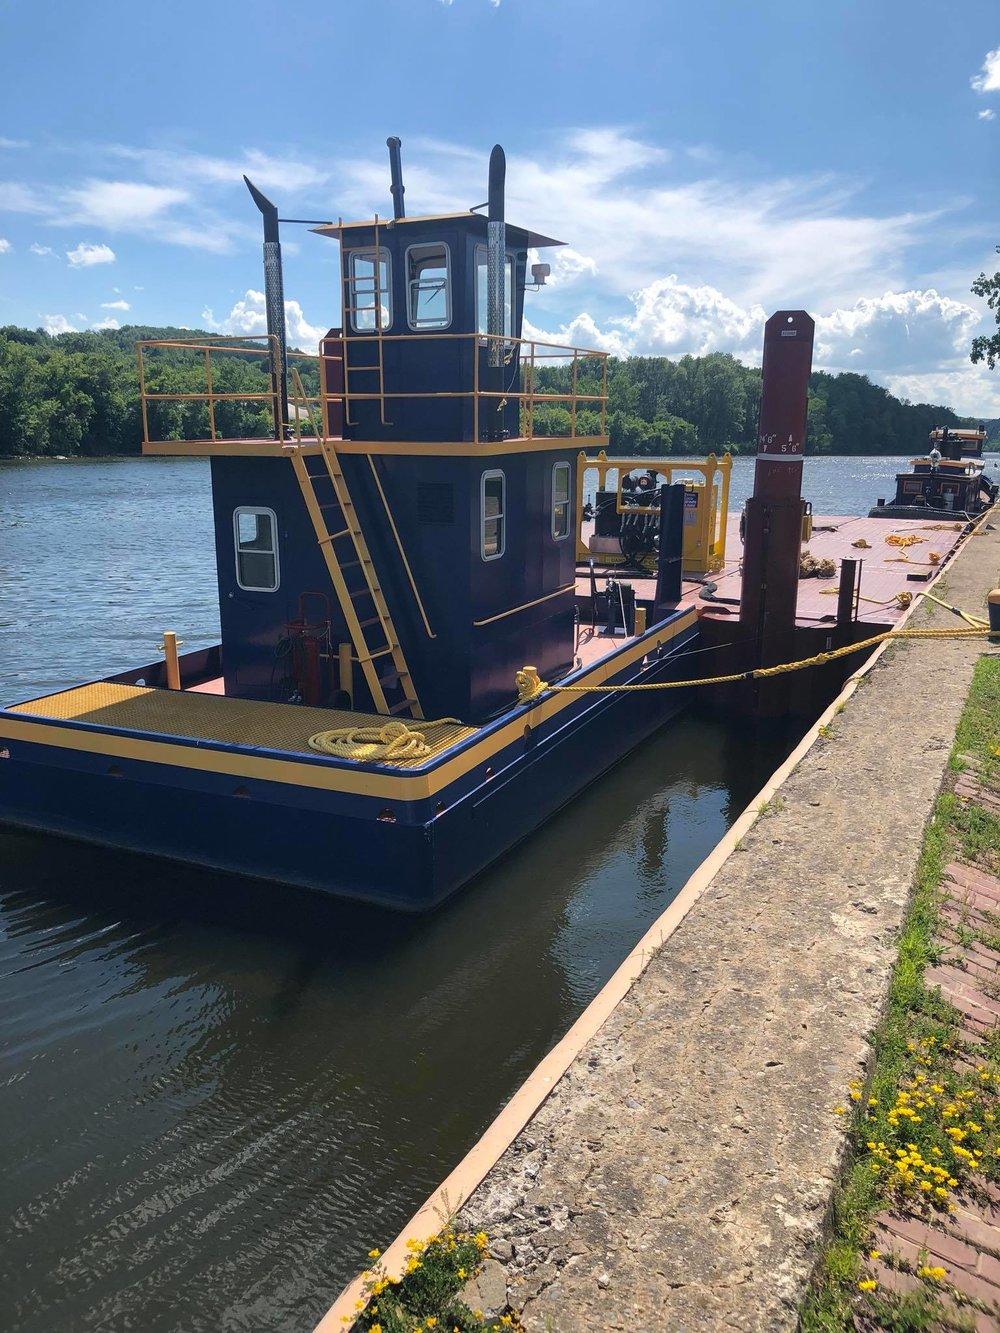 NYS Canal Corporation, NY Power Authority, Seaway Marine Group, truckable tug, training